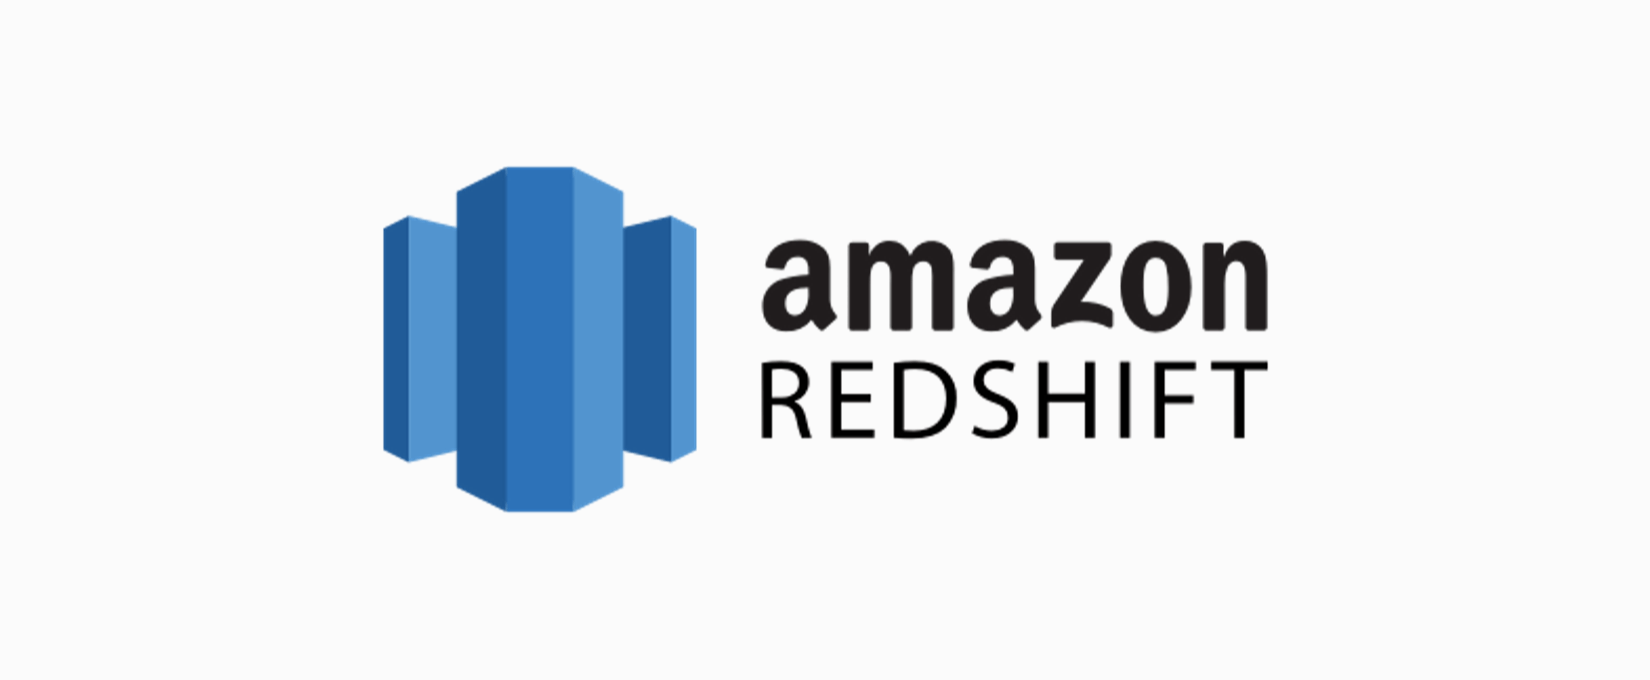 Amazon Redshift - 11 Key Points to Remember - blazeclan